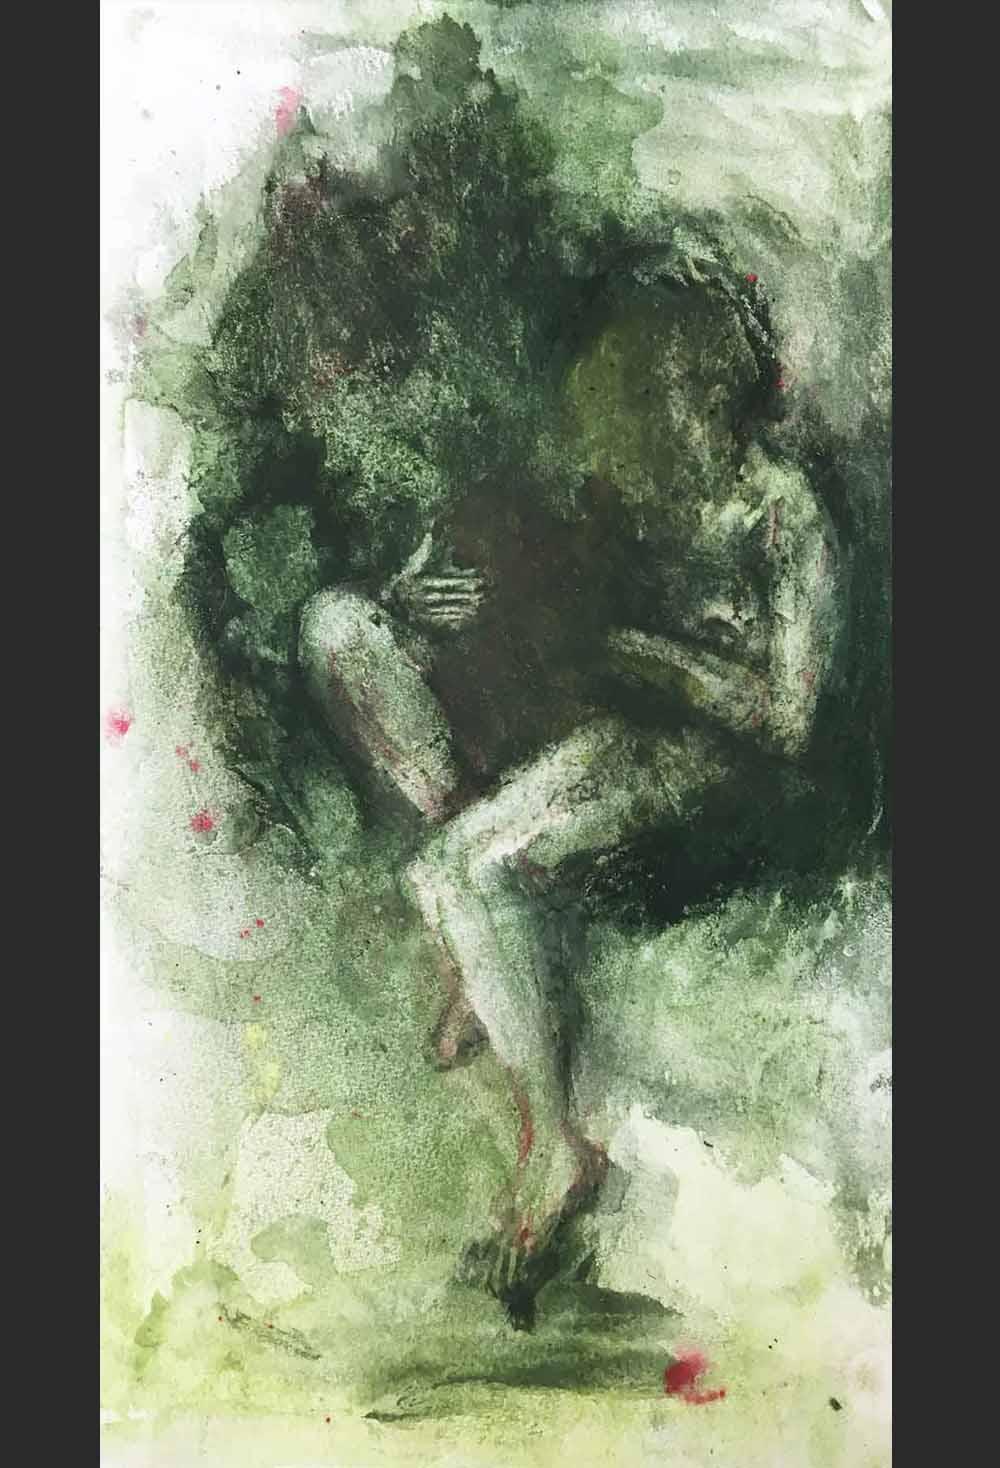 Sue Greeff Nurture 2017 Giclé print on epson smooth paper Edition- 1 of 10 25 x 13.5 cm